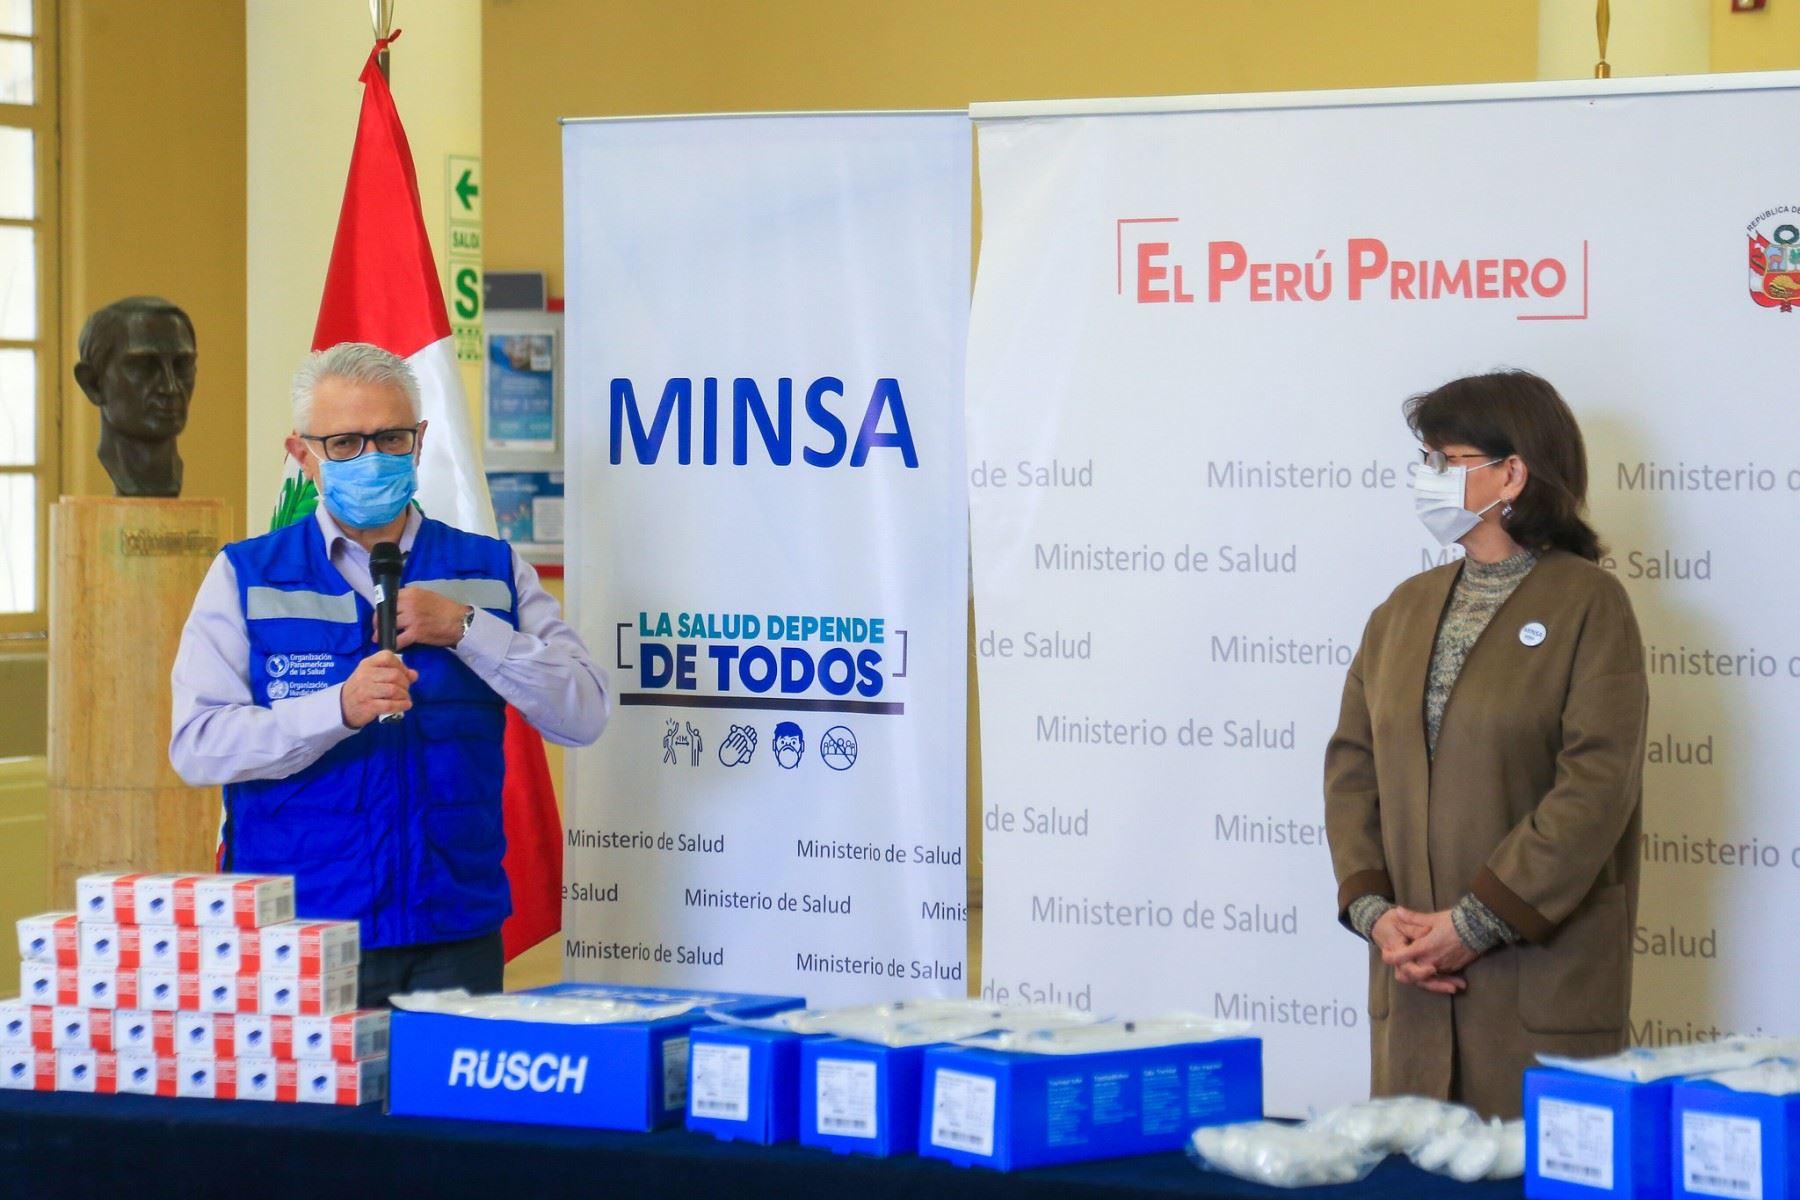 Coronavirus: Minsa recibe cerca de 2,000 pulsioxímetros para monitoreo de pacientes   Noticias